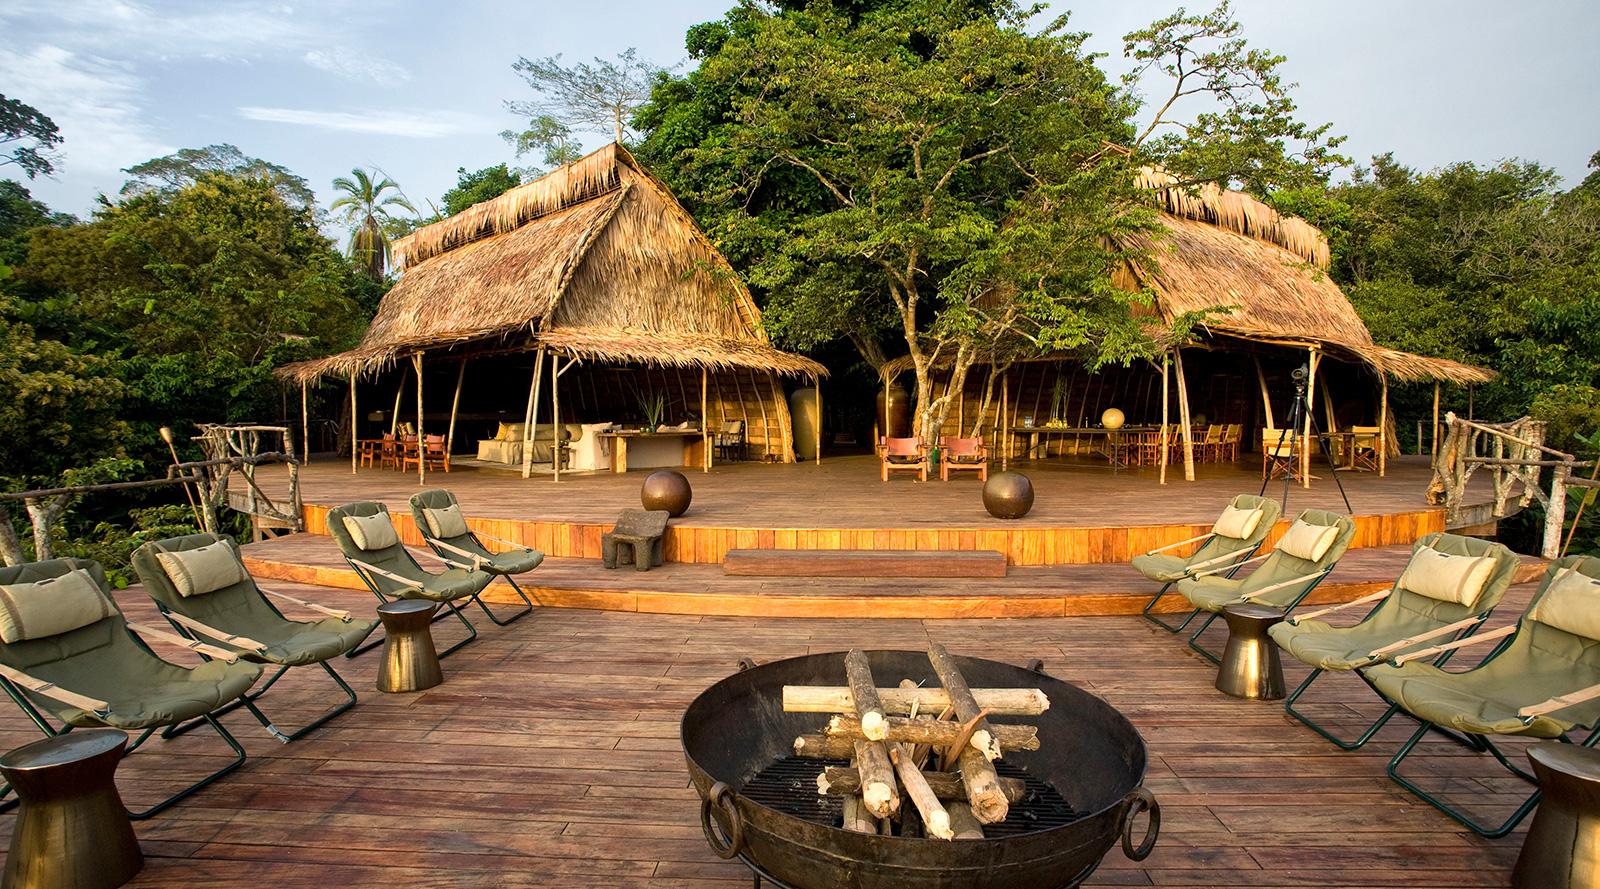 © Wilderness Safaris | Odzala Lango Camp, Congo